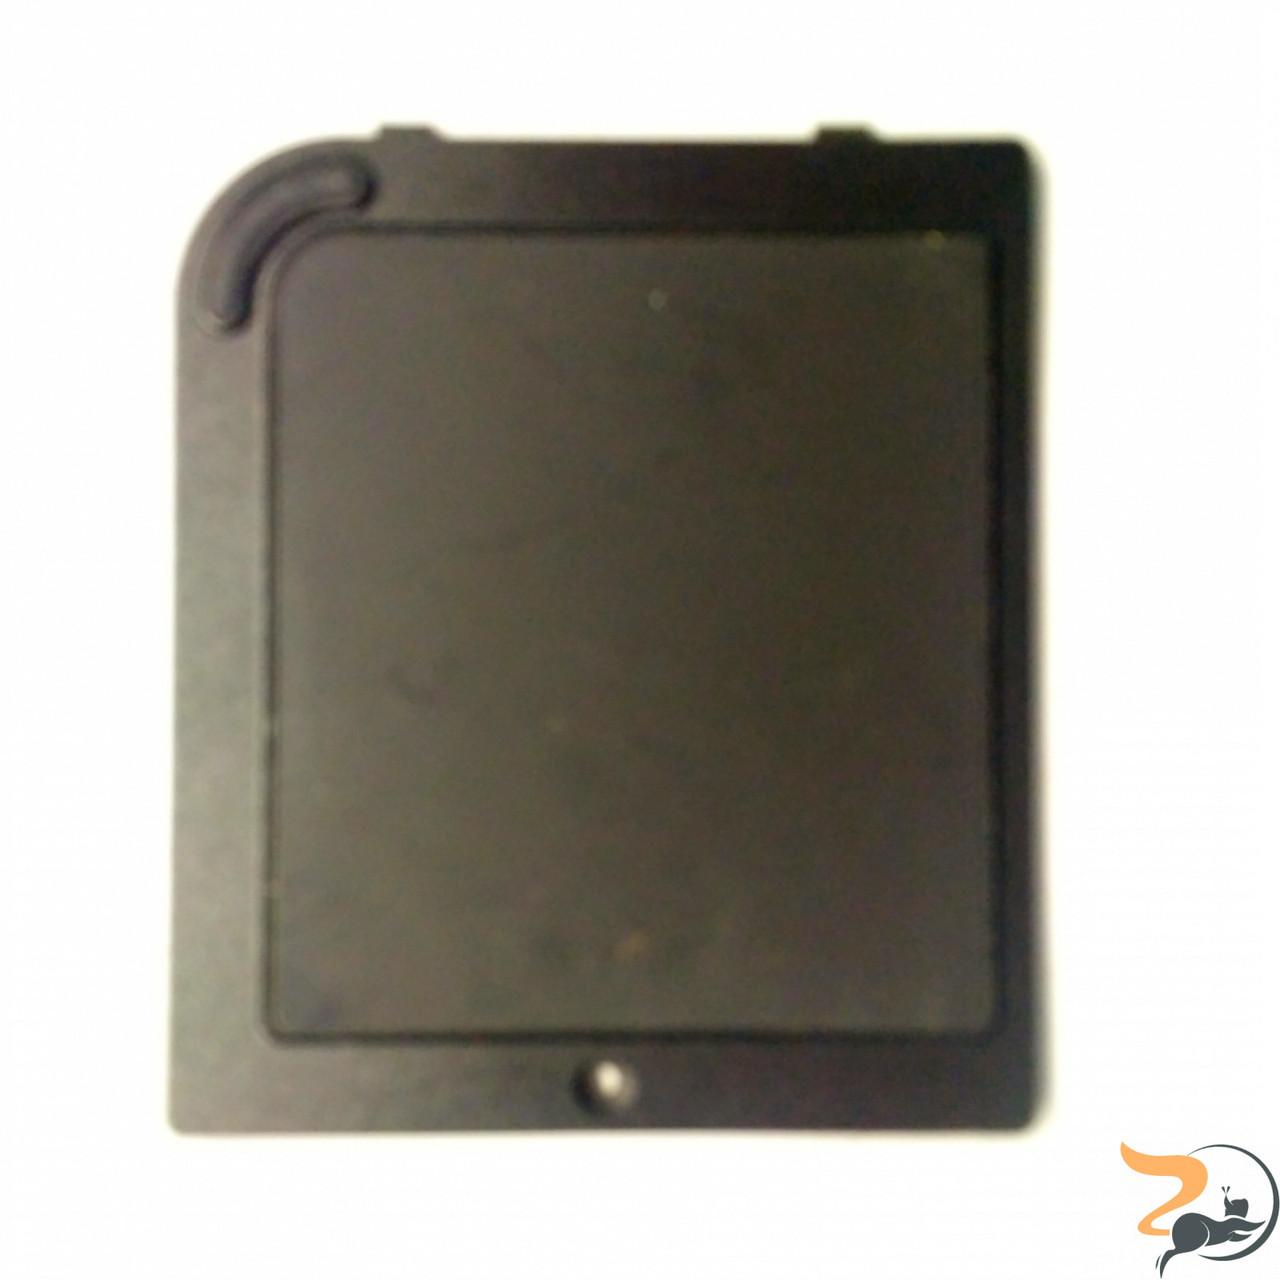 Сервісна кришка для ноутбука Compaq Evo N1020v, AABZ50200003S1, Б/В.Без пошкоджень